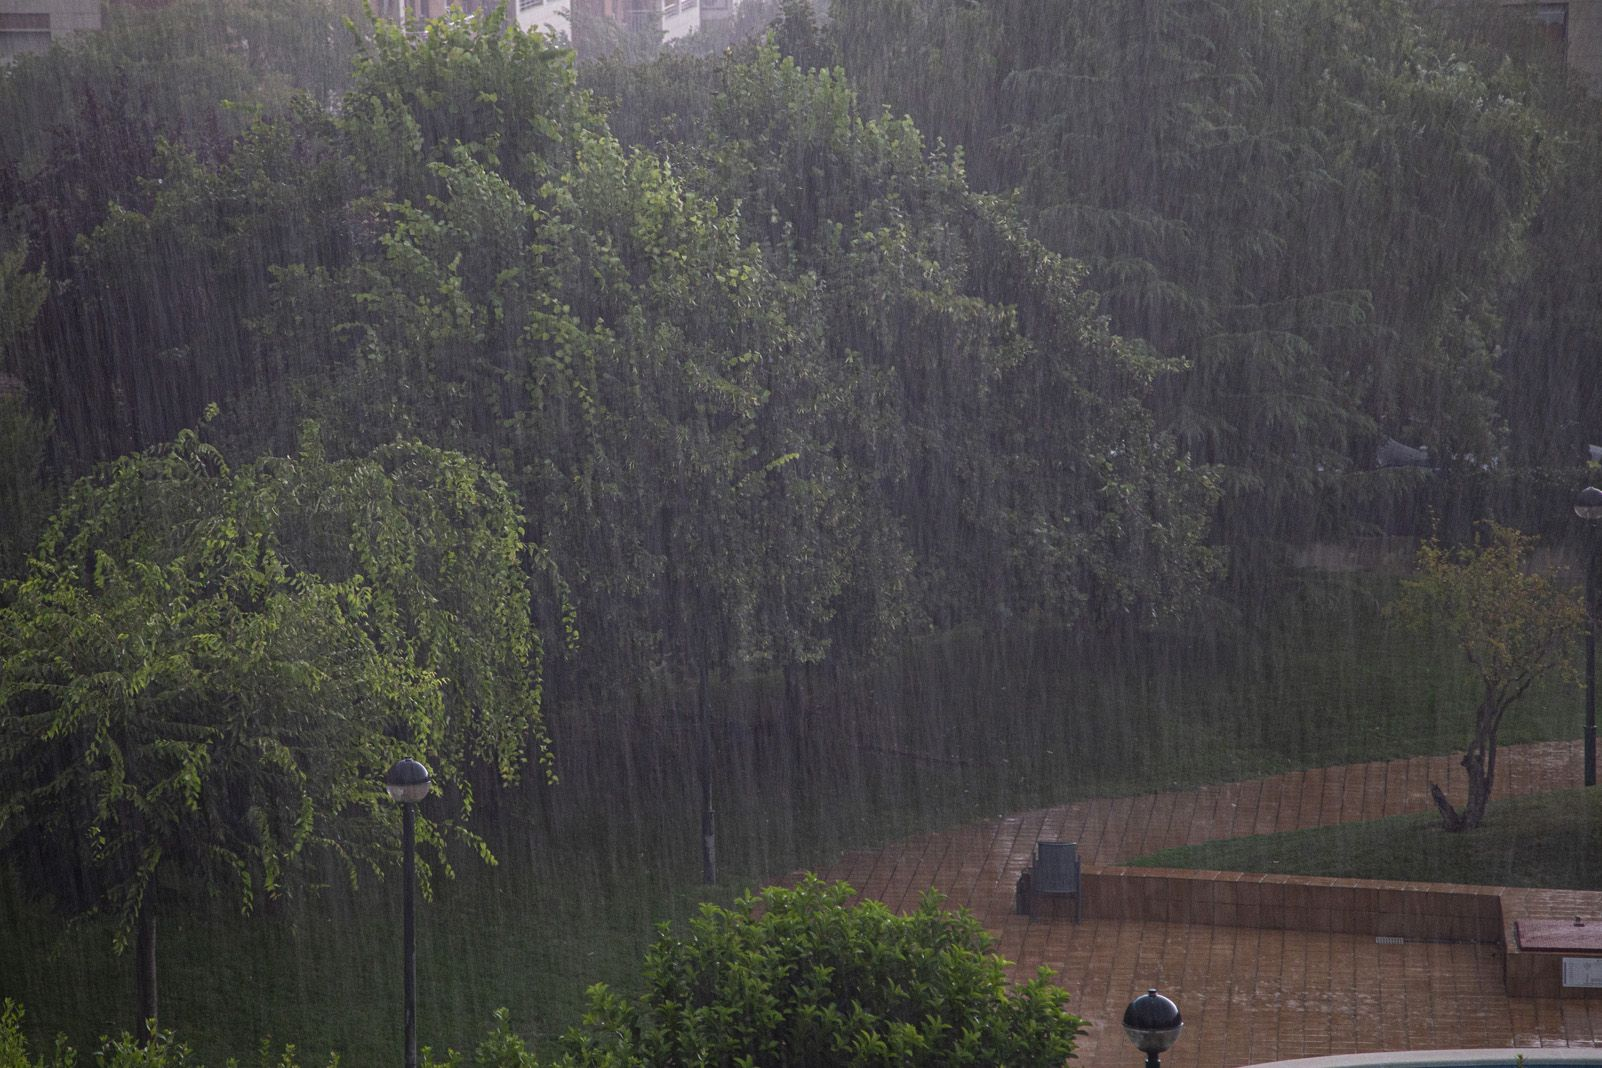 Pluja durant la tempesta a Sant Cugat. Foto: Cedida.